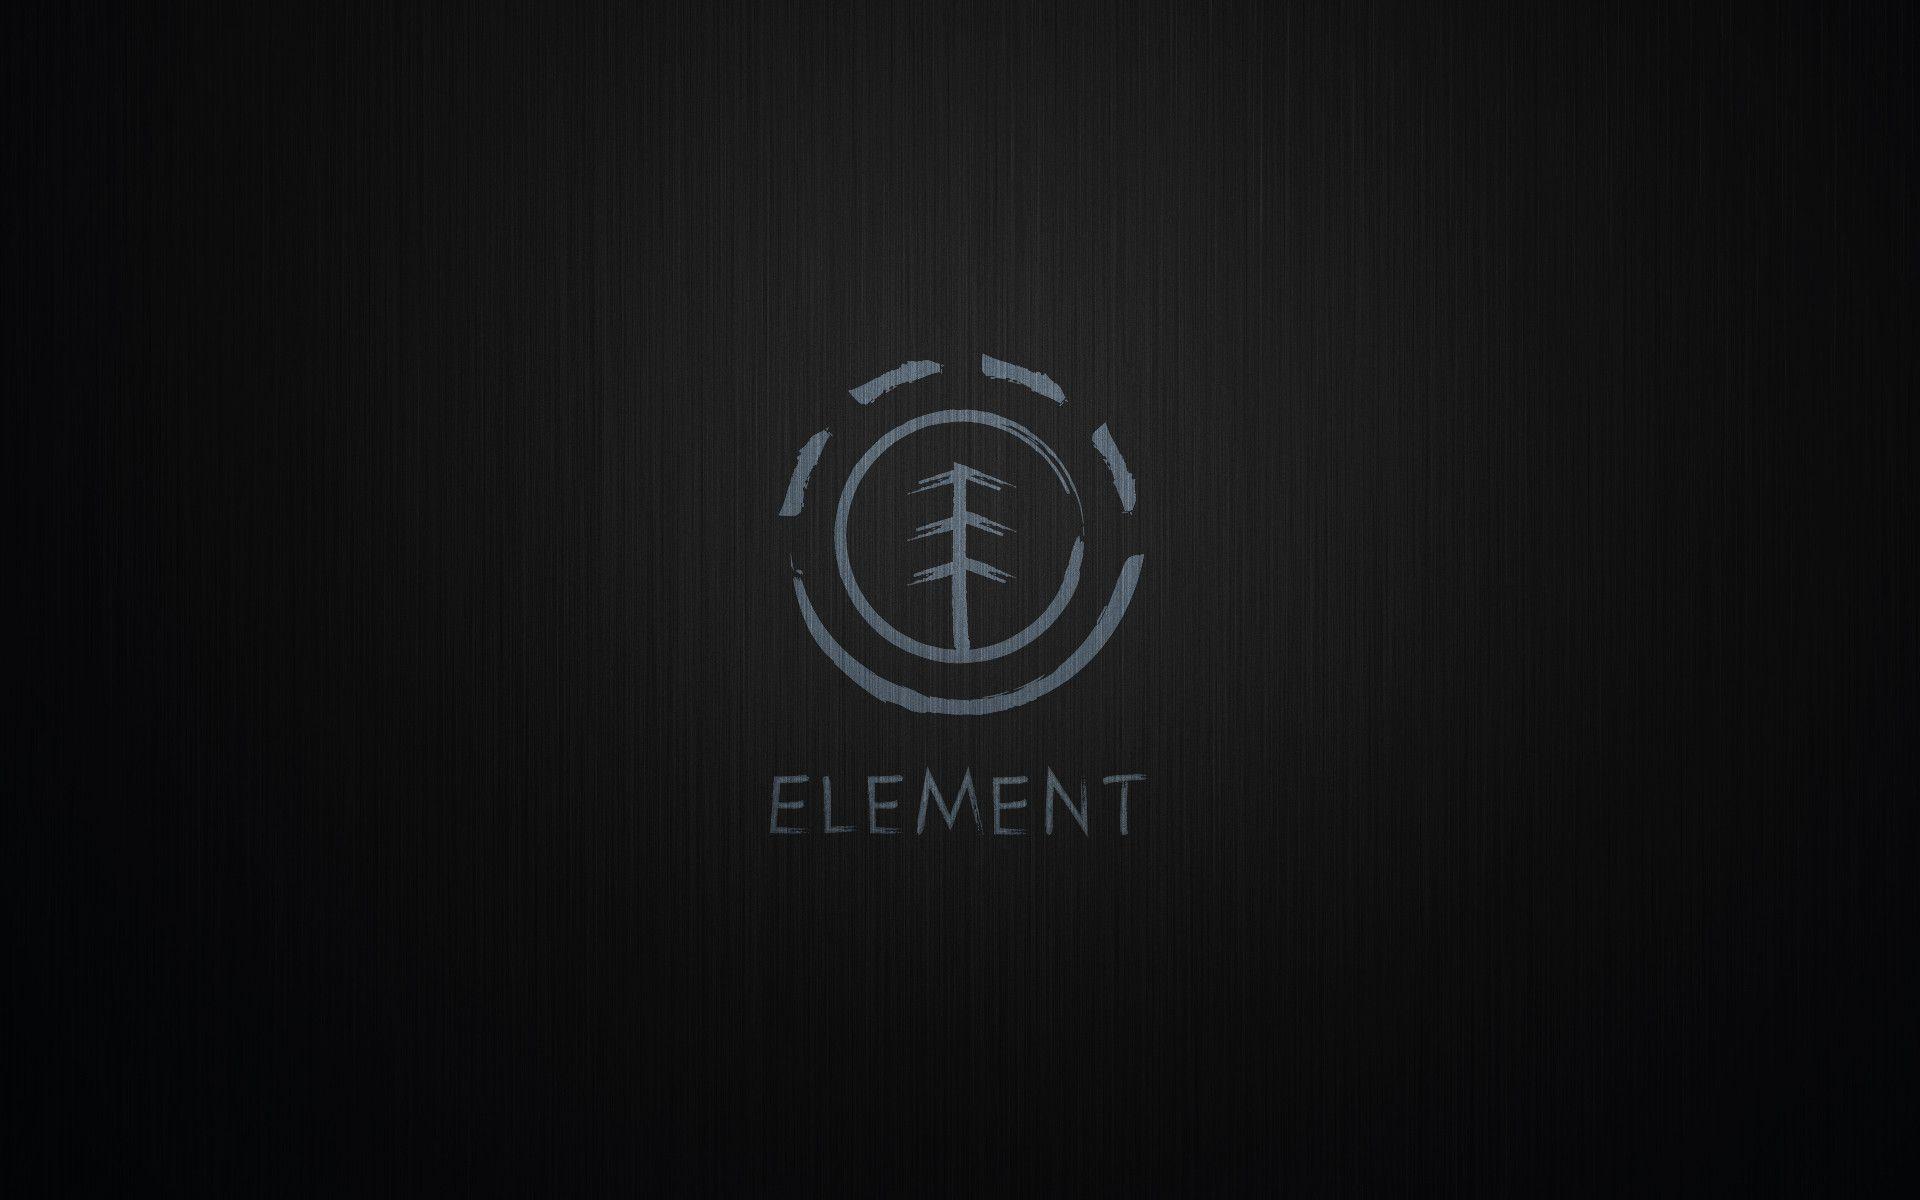 Element Wallpapers Wallpaper Cave